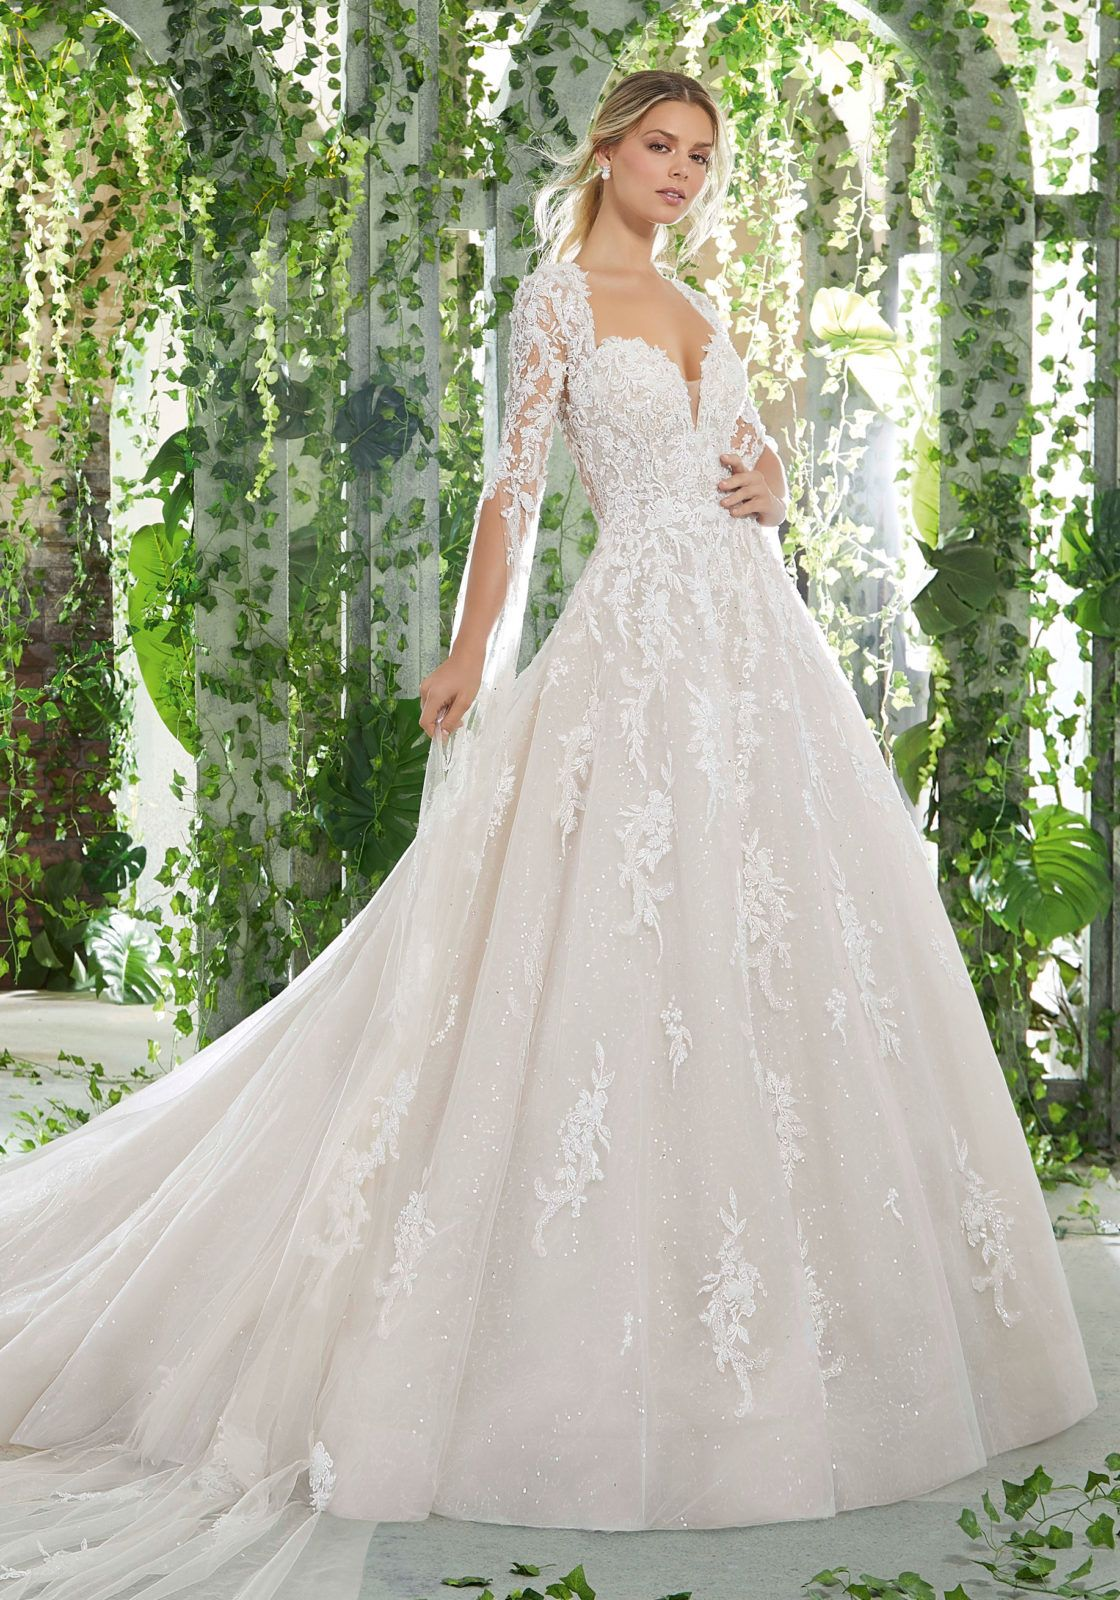 04fbfc6877e3 Persephone Wedding Dress Drop Waist Wedding Dress, Wedding Gowns With  Sleeves, Bridal Wedding Dresses